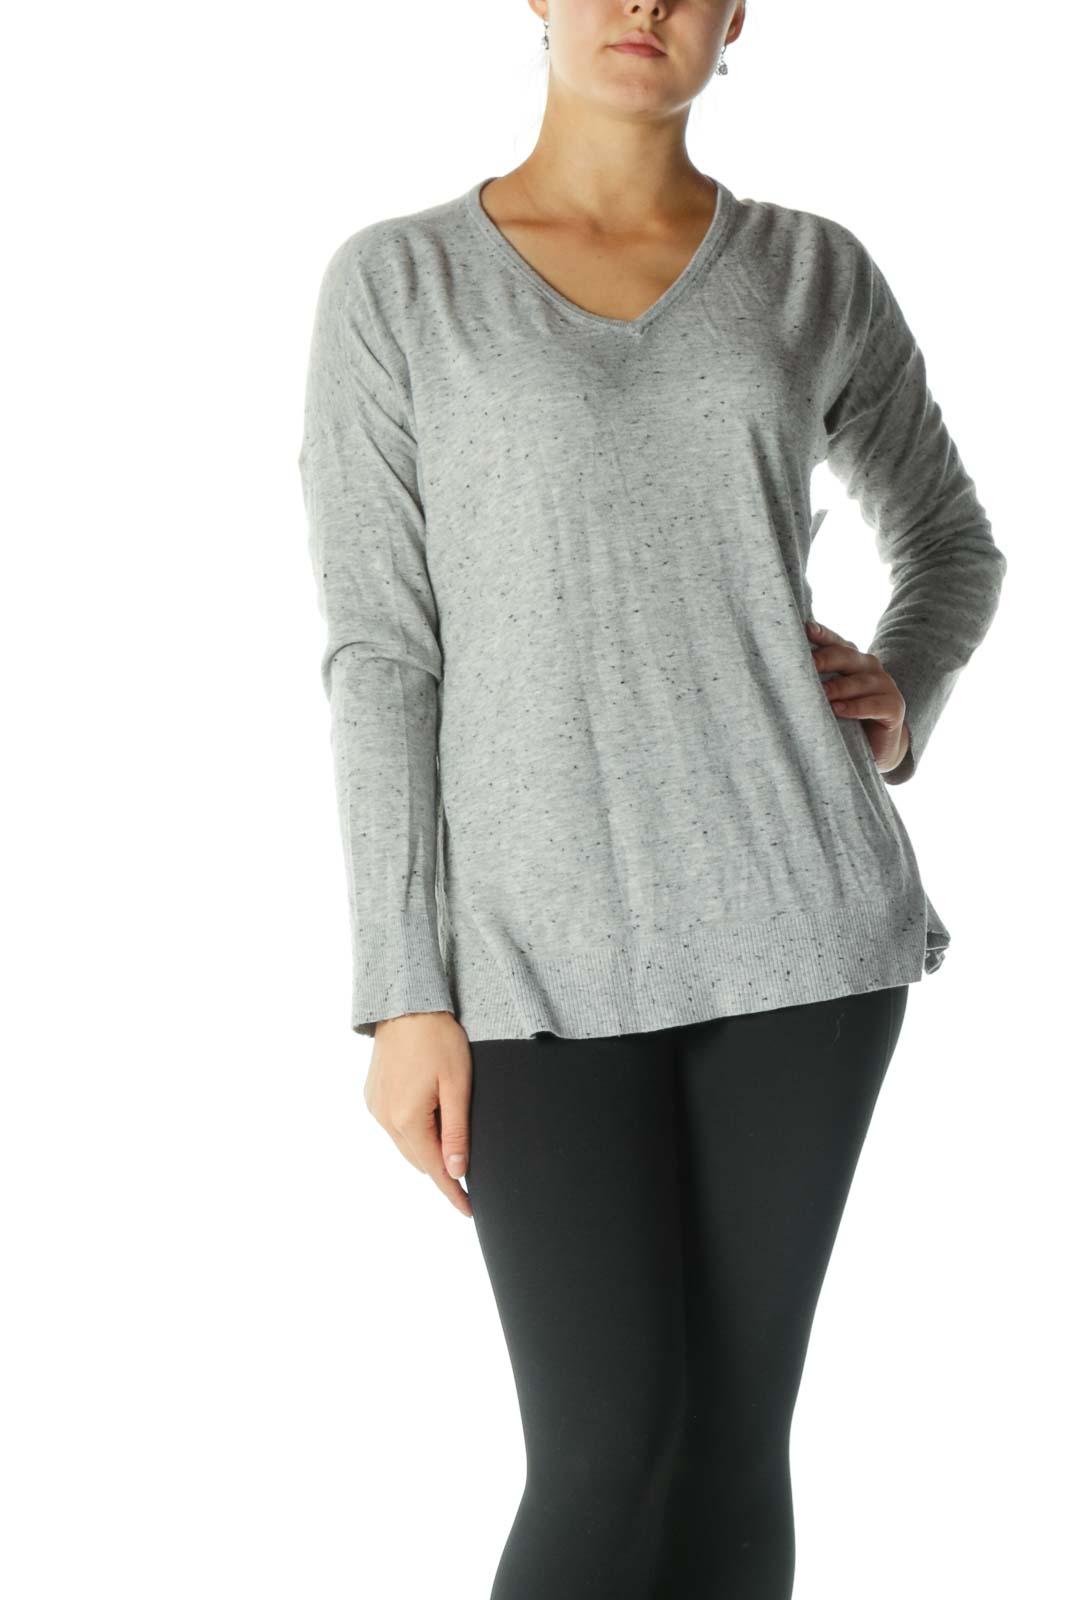 Gray Speckled Sweatshirt Front